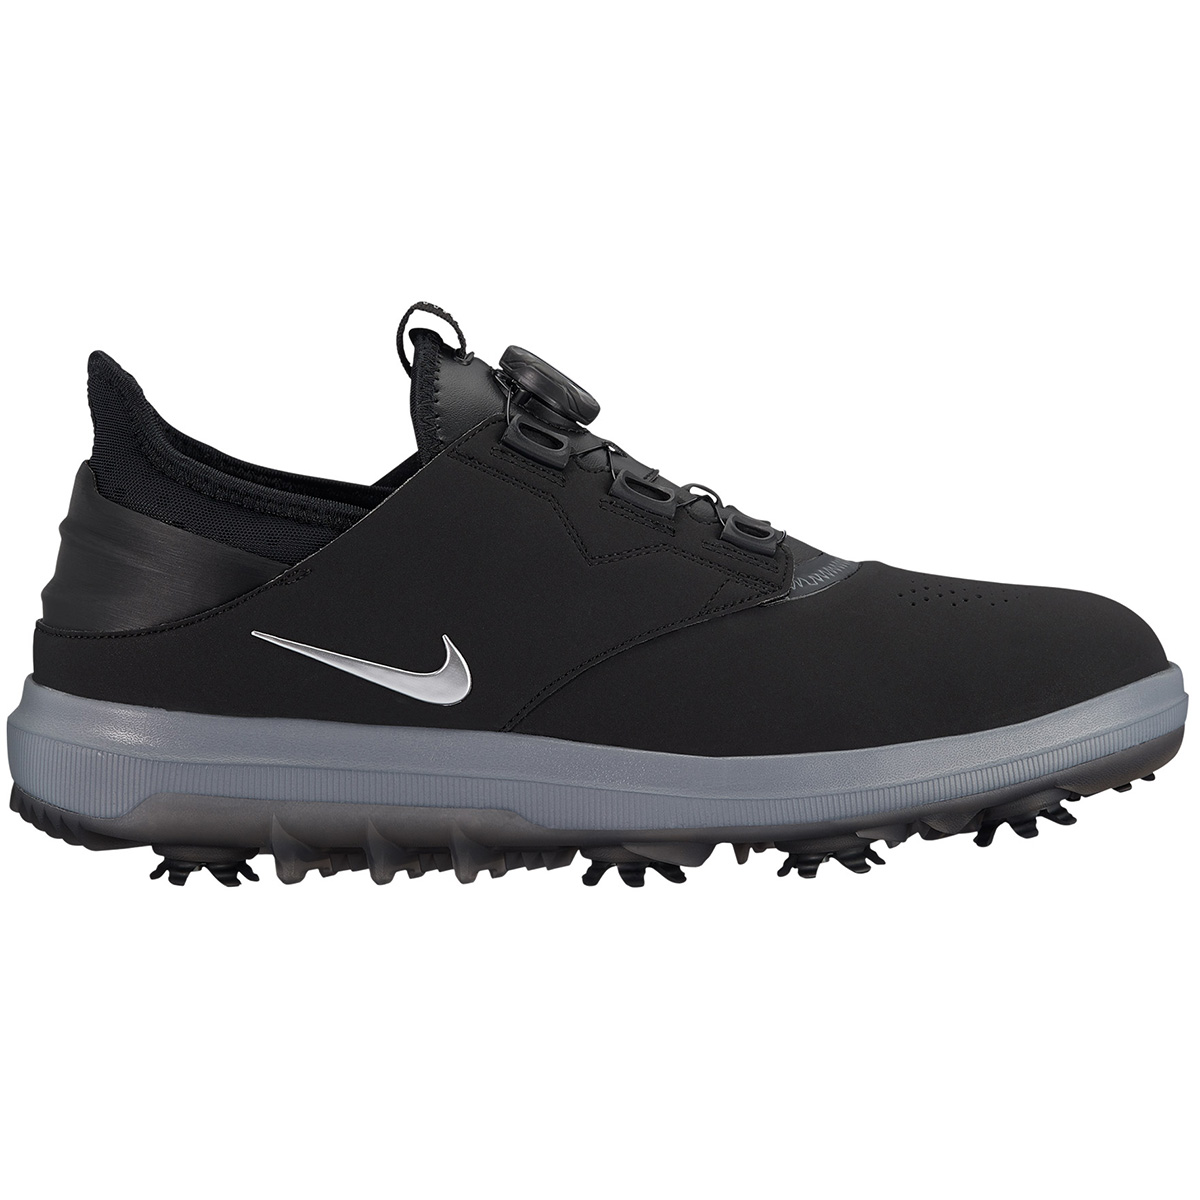 Nike Golf Air Zoom Direct Boa Shoes